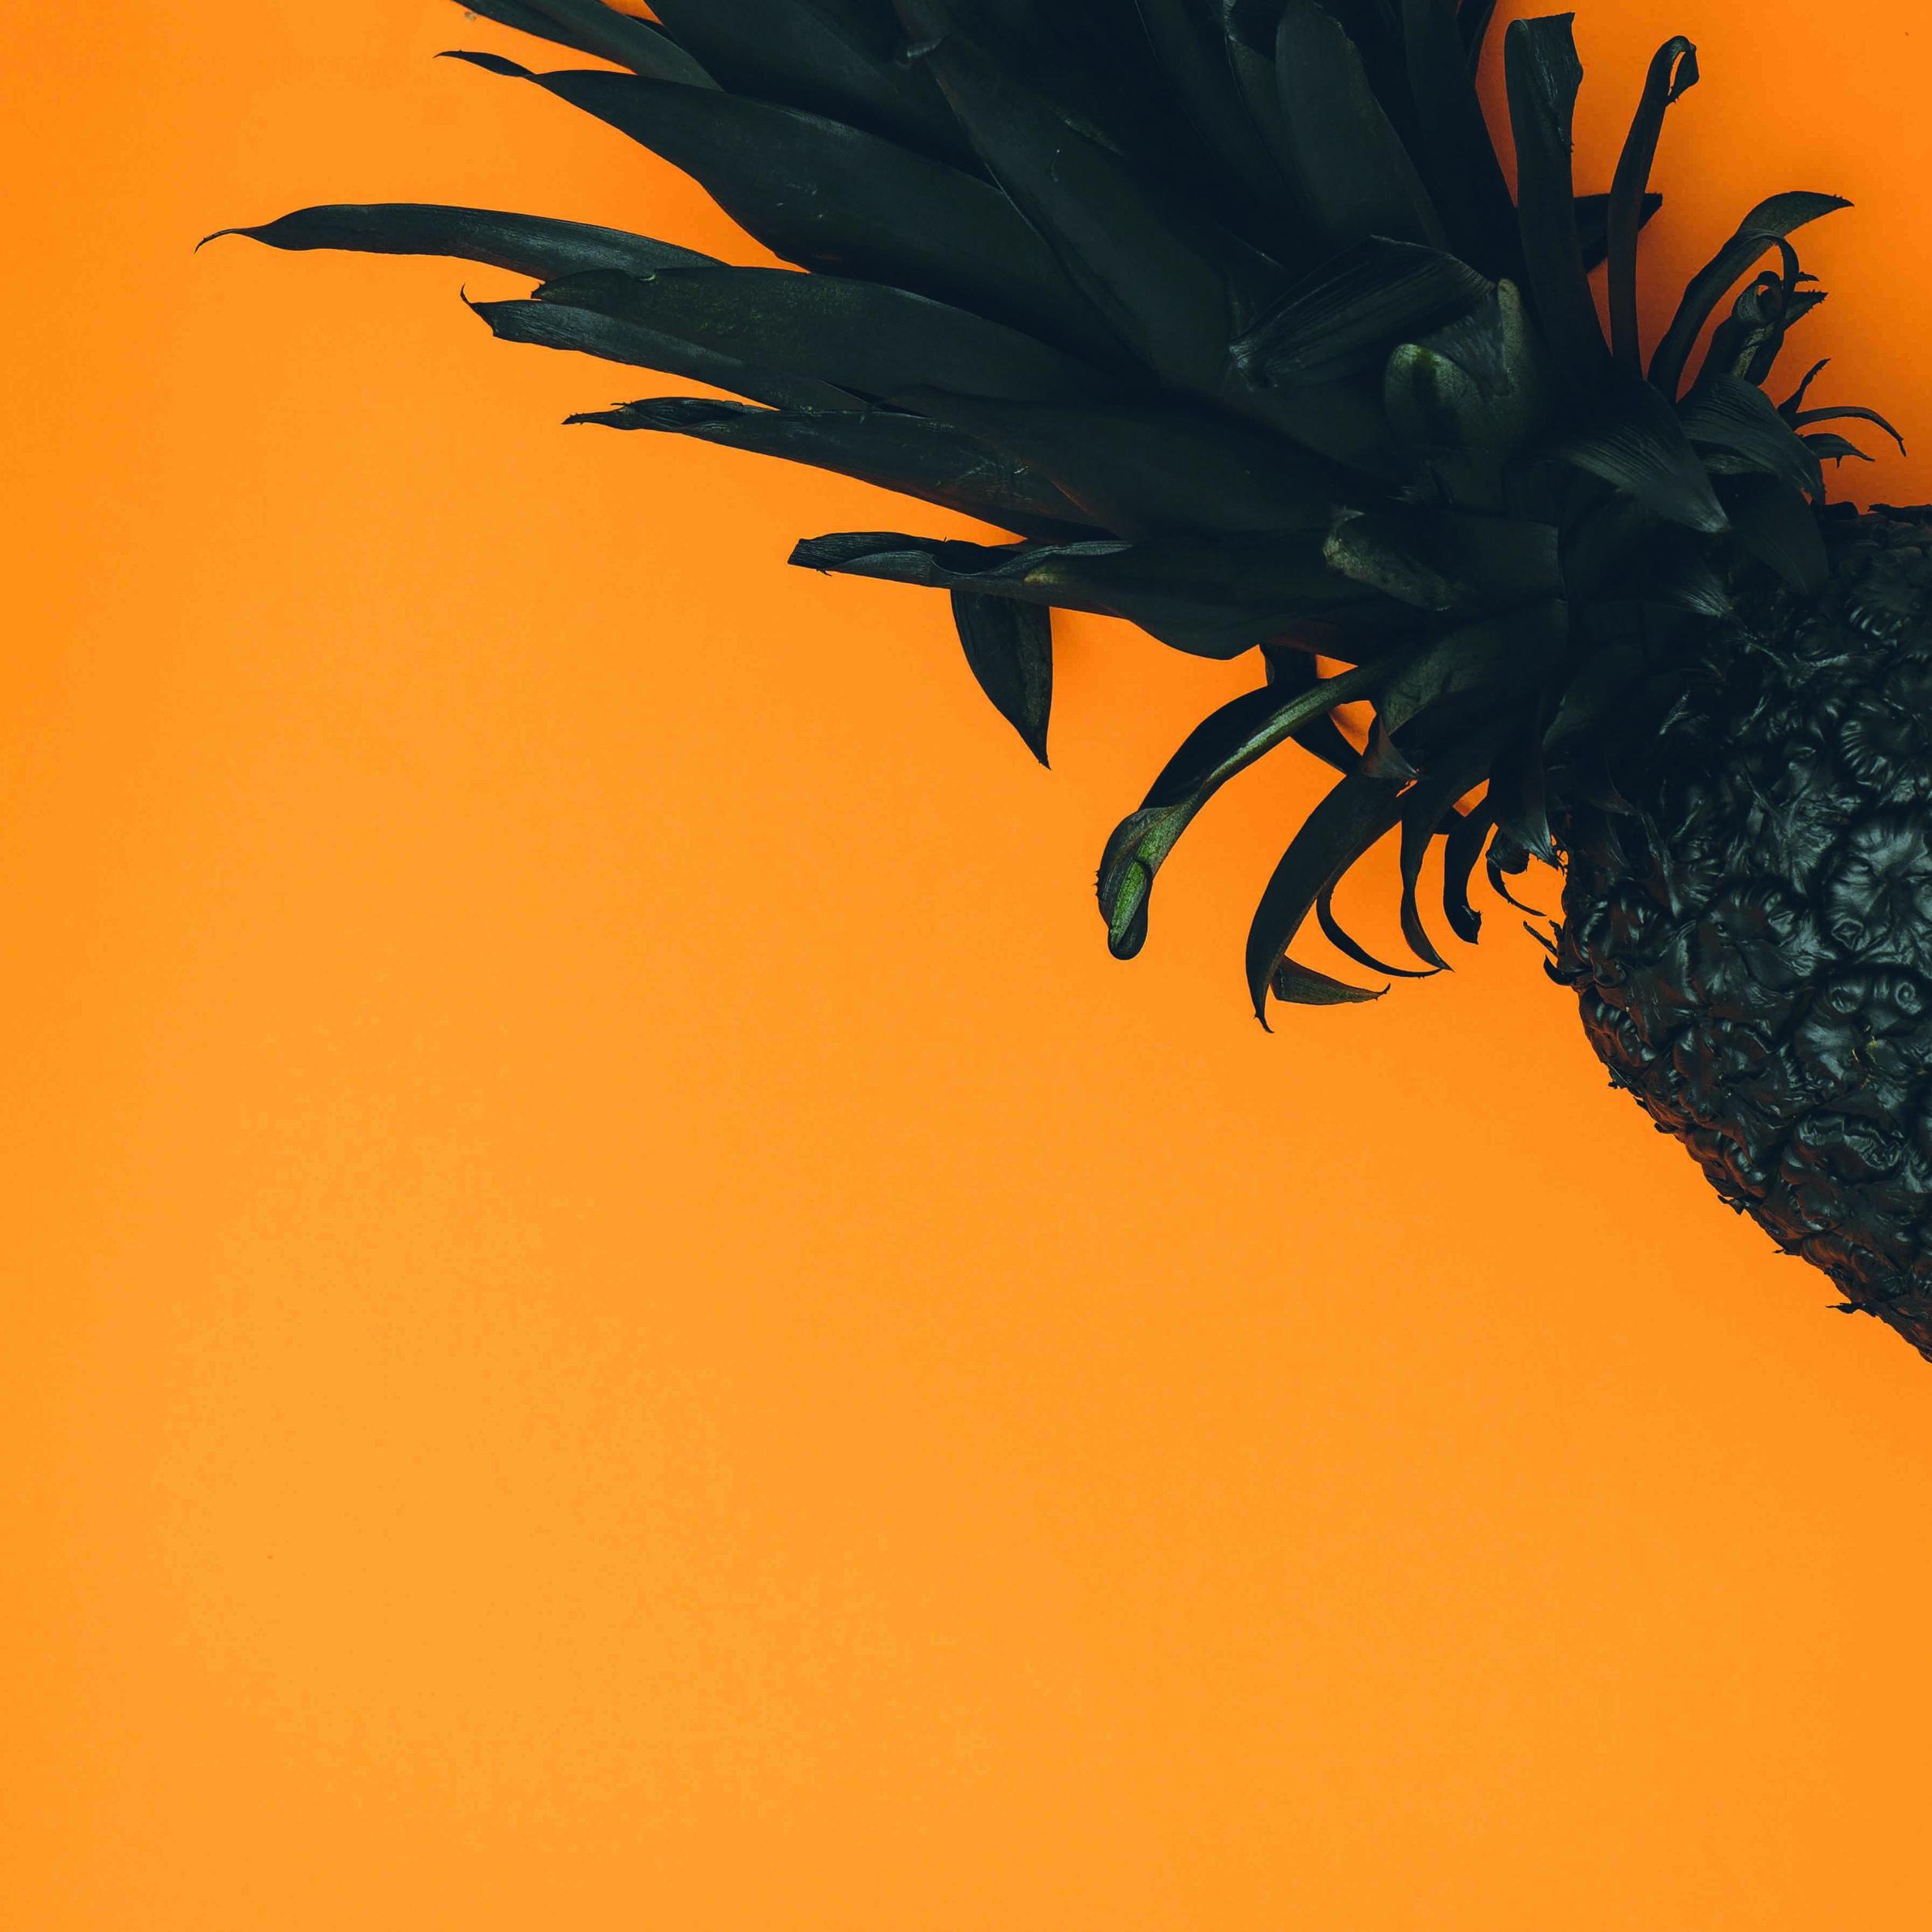 pineapple-supply-co-FivolqHz3bg-unsplash.jpg